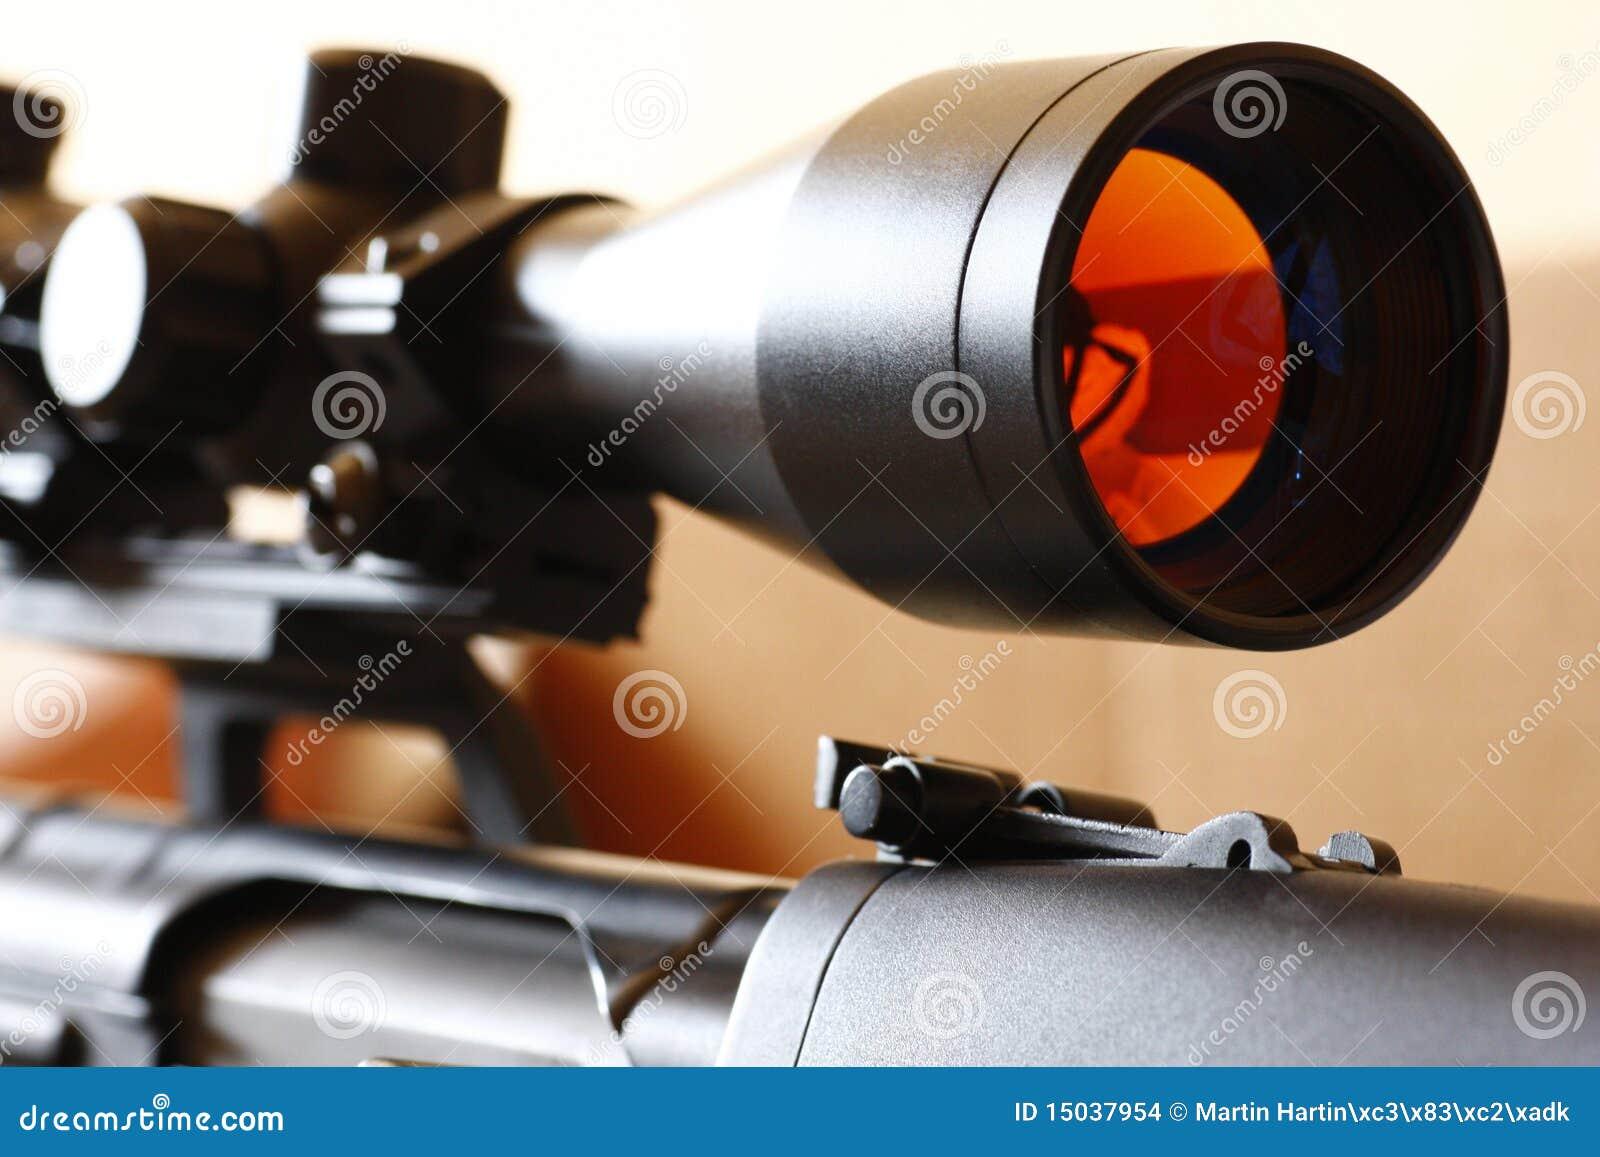 Sniper rifle scope stock photo  Image of sniper, rifle